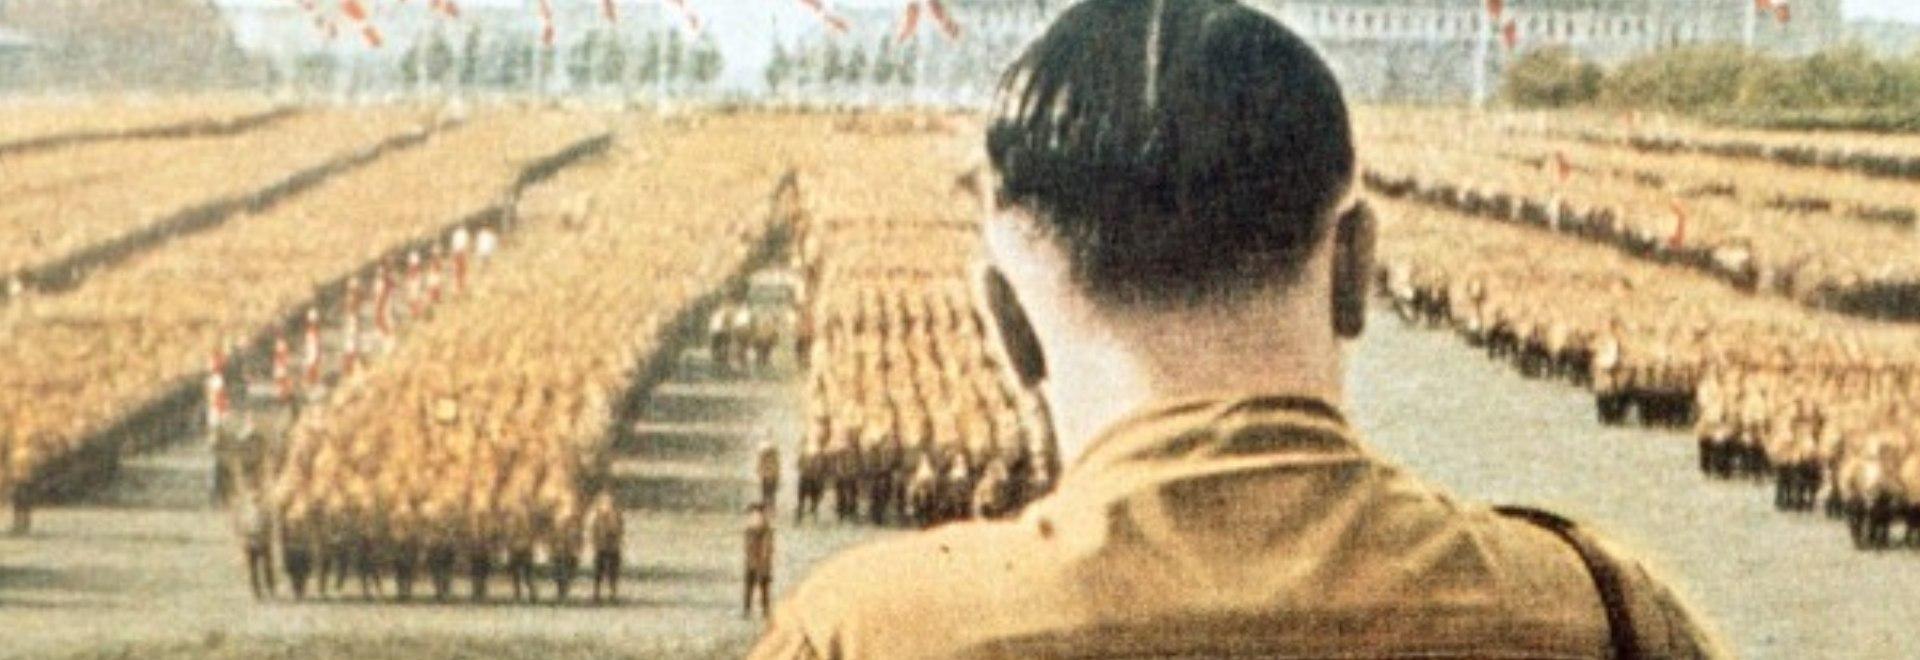 Apocalypse: la Seconda Guerra Mondiale